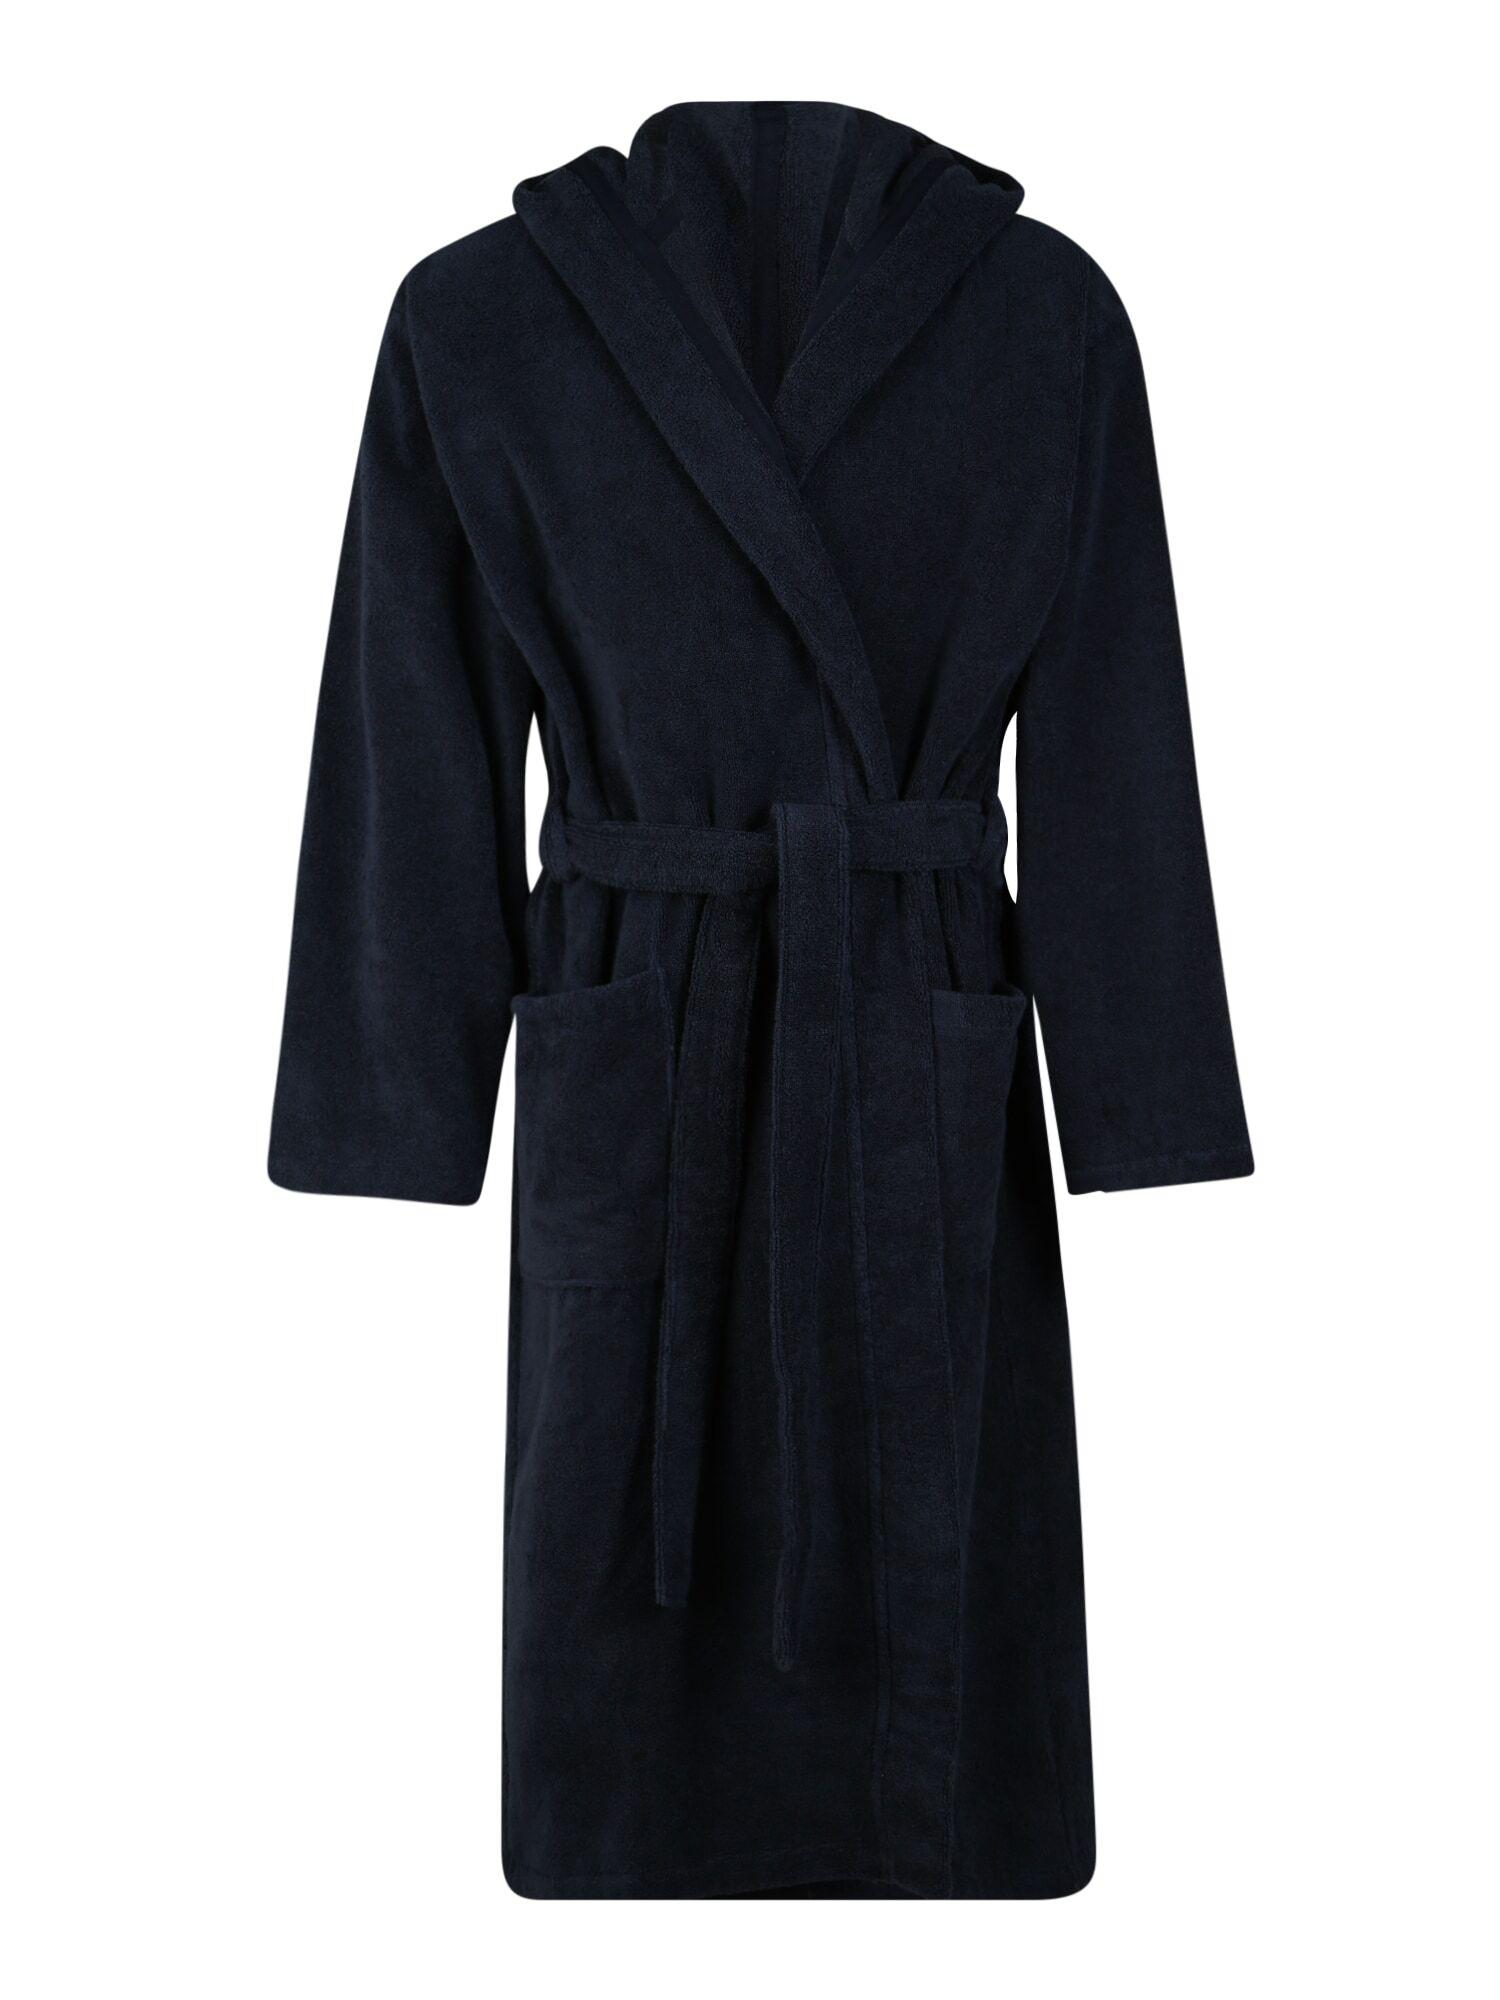 SCHIESSER Peignoir long  - Bleu - Taille: M - male